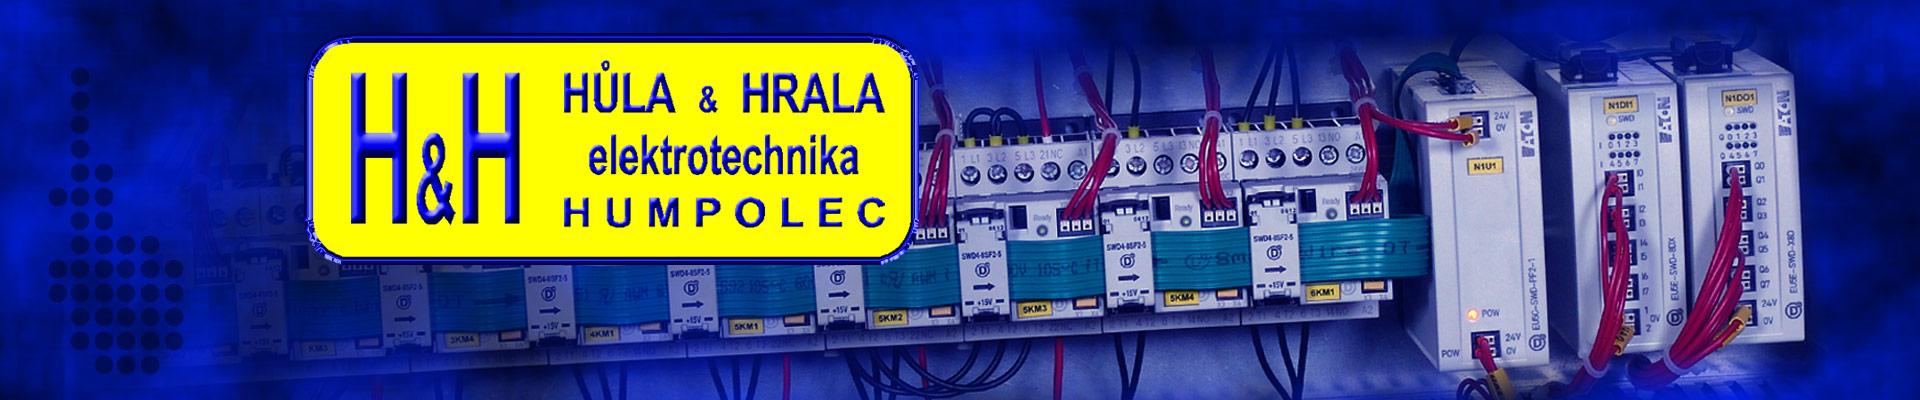 logo firmy HÙLA & HRALA Elektrotechnika